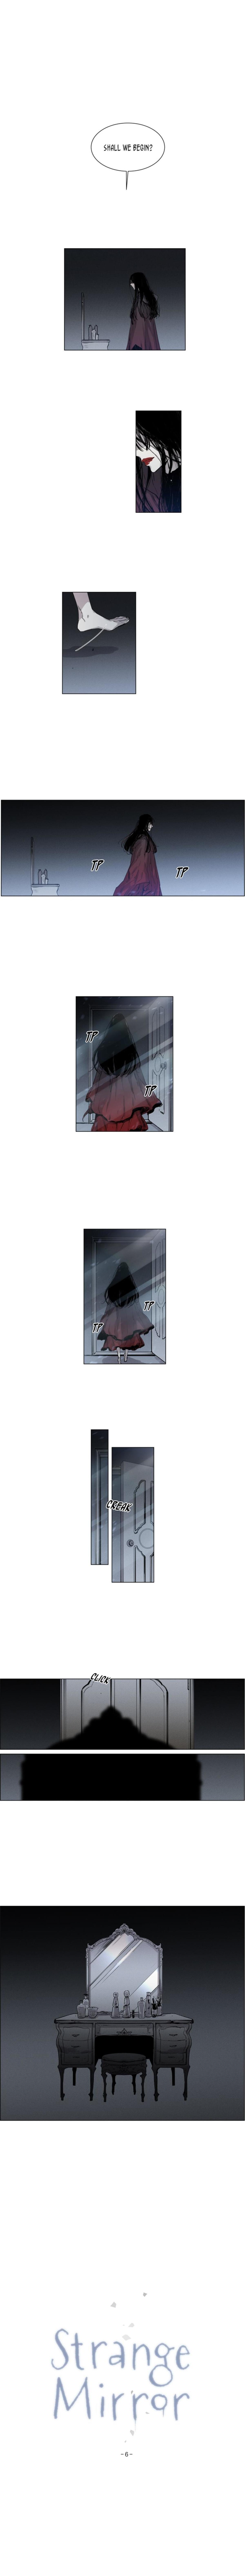 Strange Mirror 7: Shall We Begin. Source: tapas.io/series/strangemirror StrangeMirror join list: StrangeMirror (59 subs)Mention History. Strange Mirror 7: Shall We Begin Source: tapas io/series/strangemirror StrangeMirror join list: (59 subs)Mention History